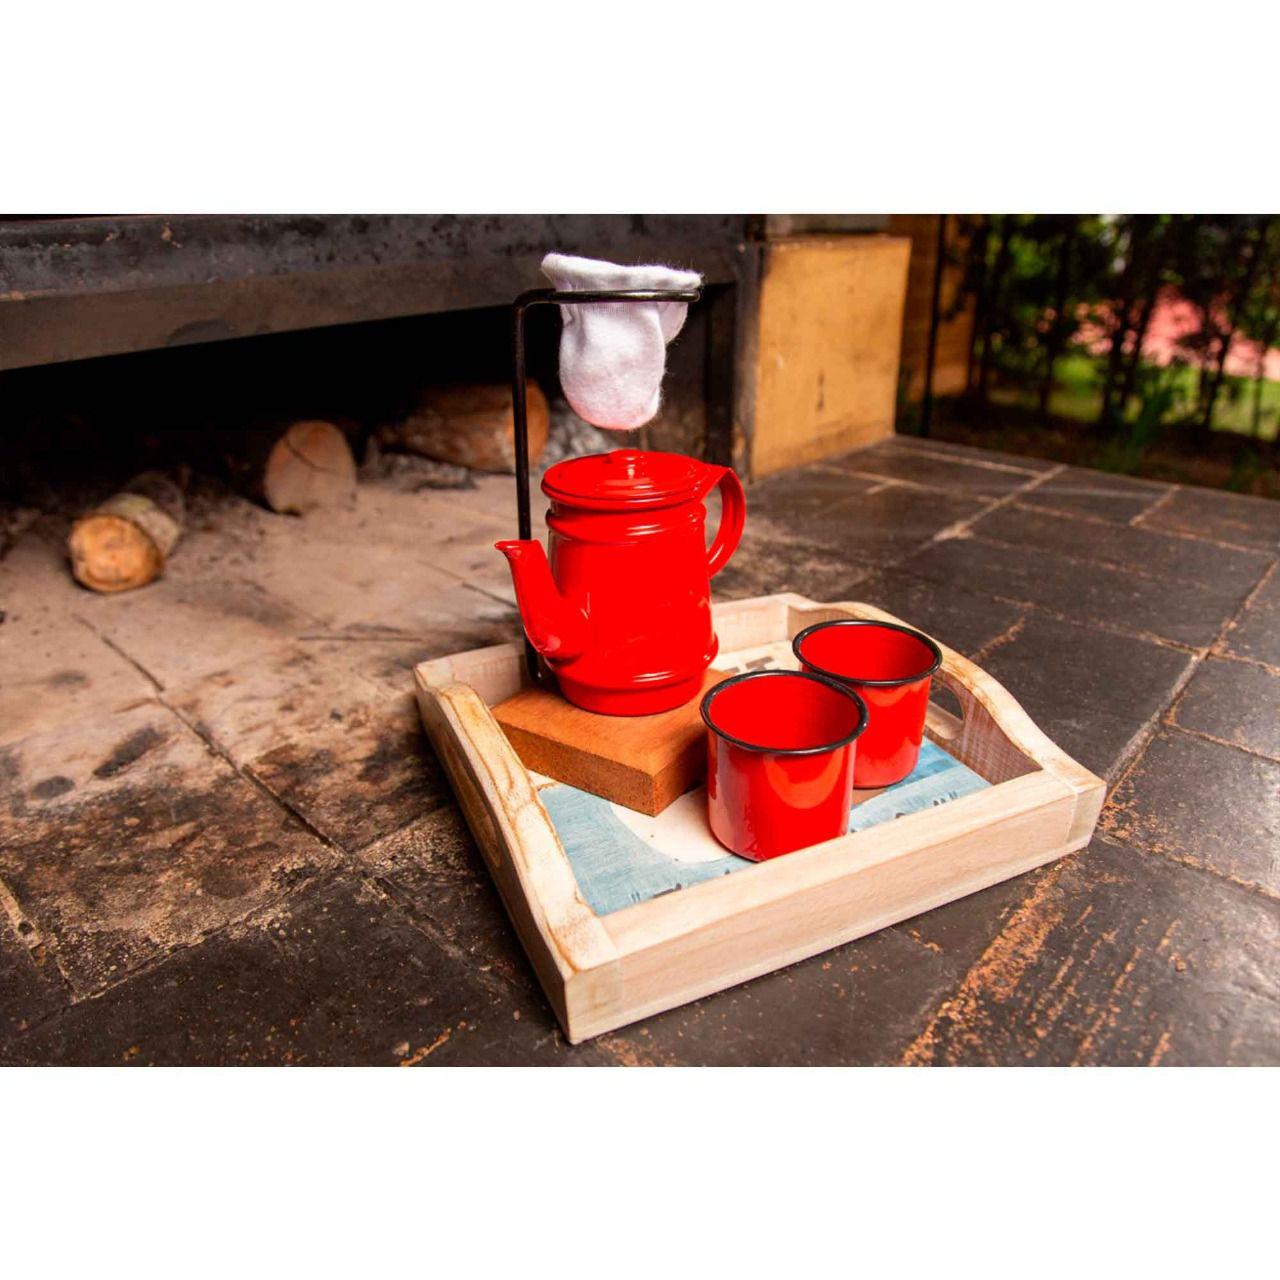 Kit bandeja bege pequena, kit bule 250 ml e canecas vermelhas